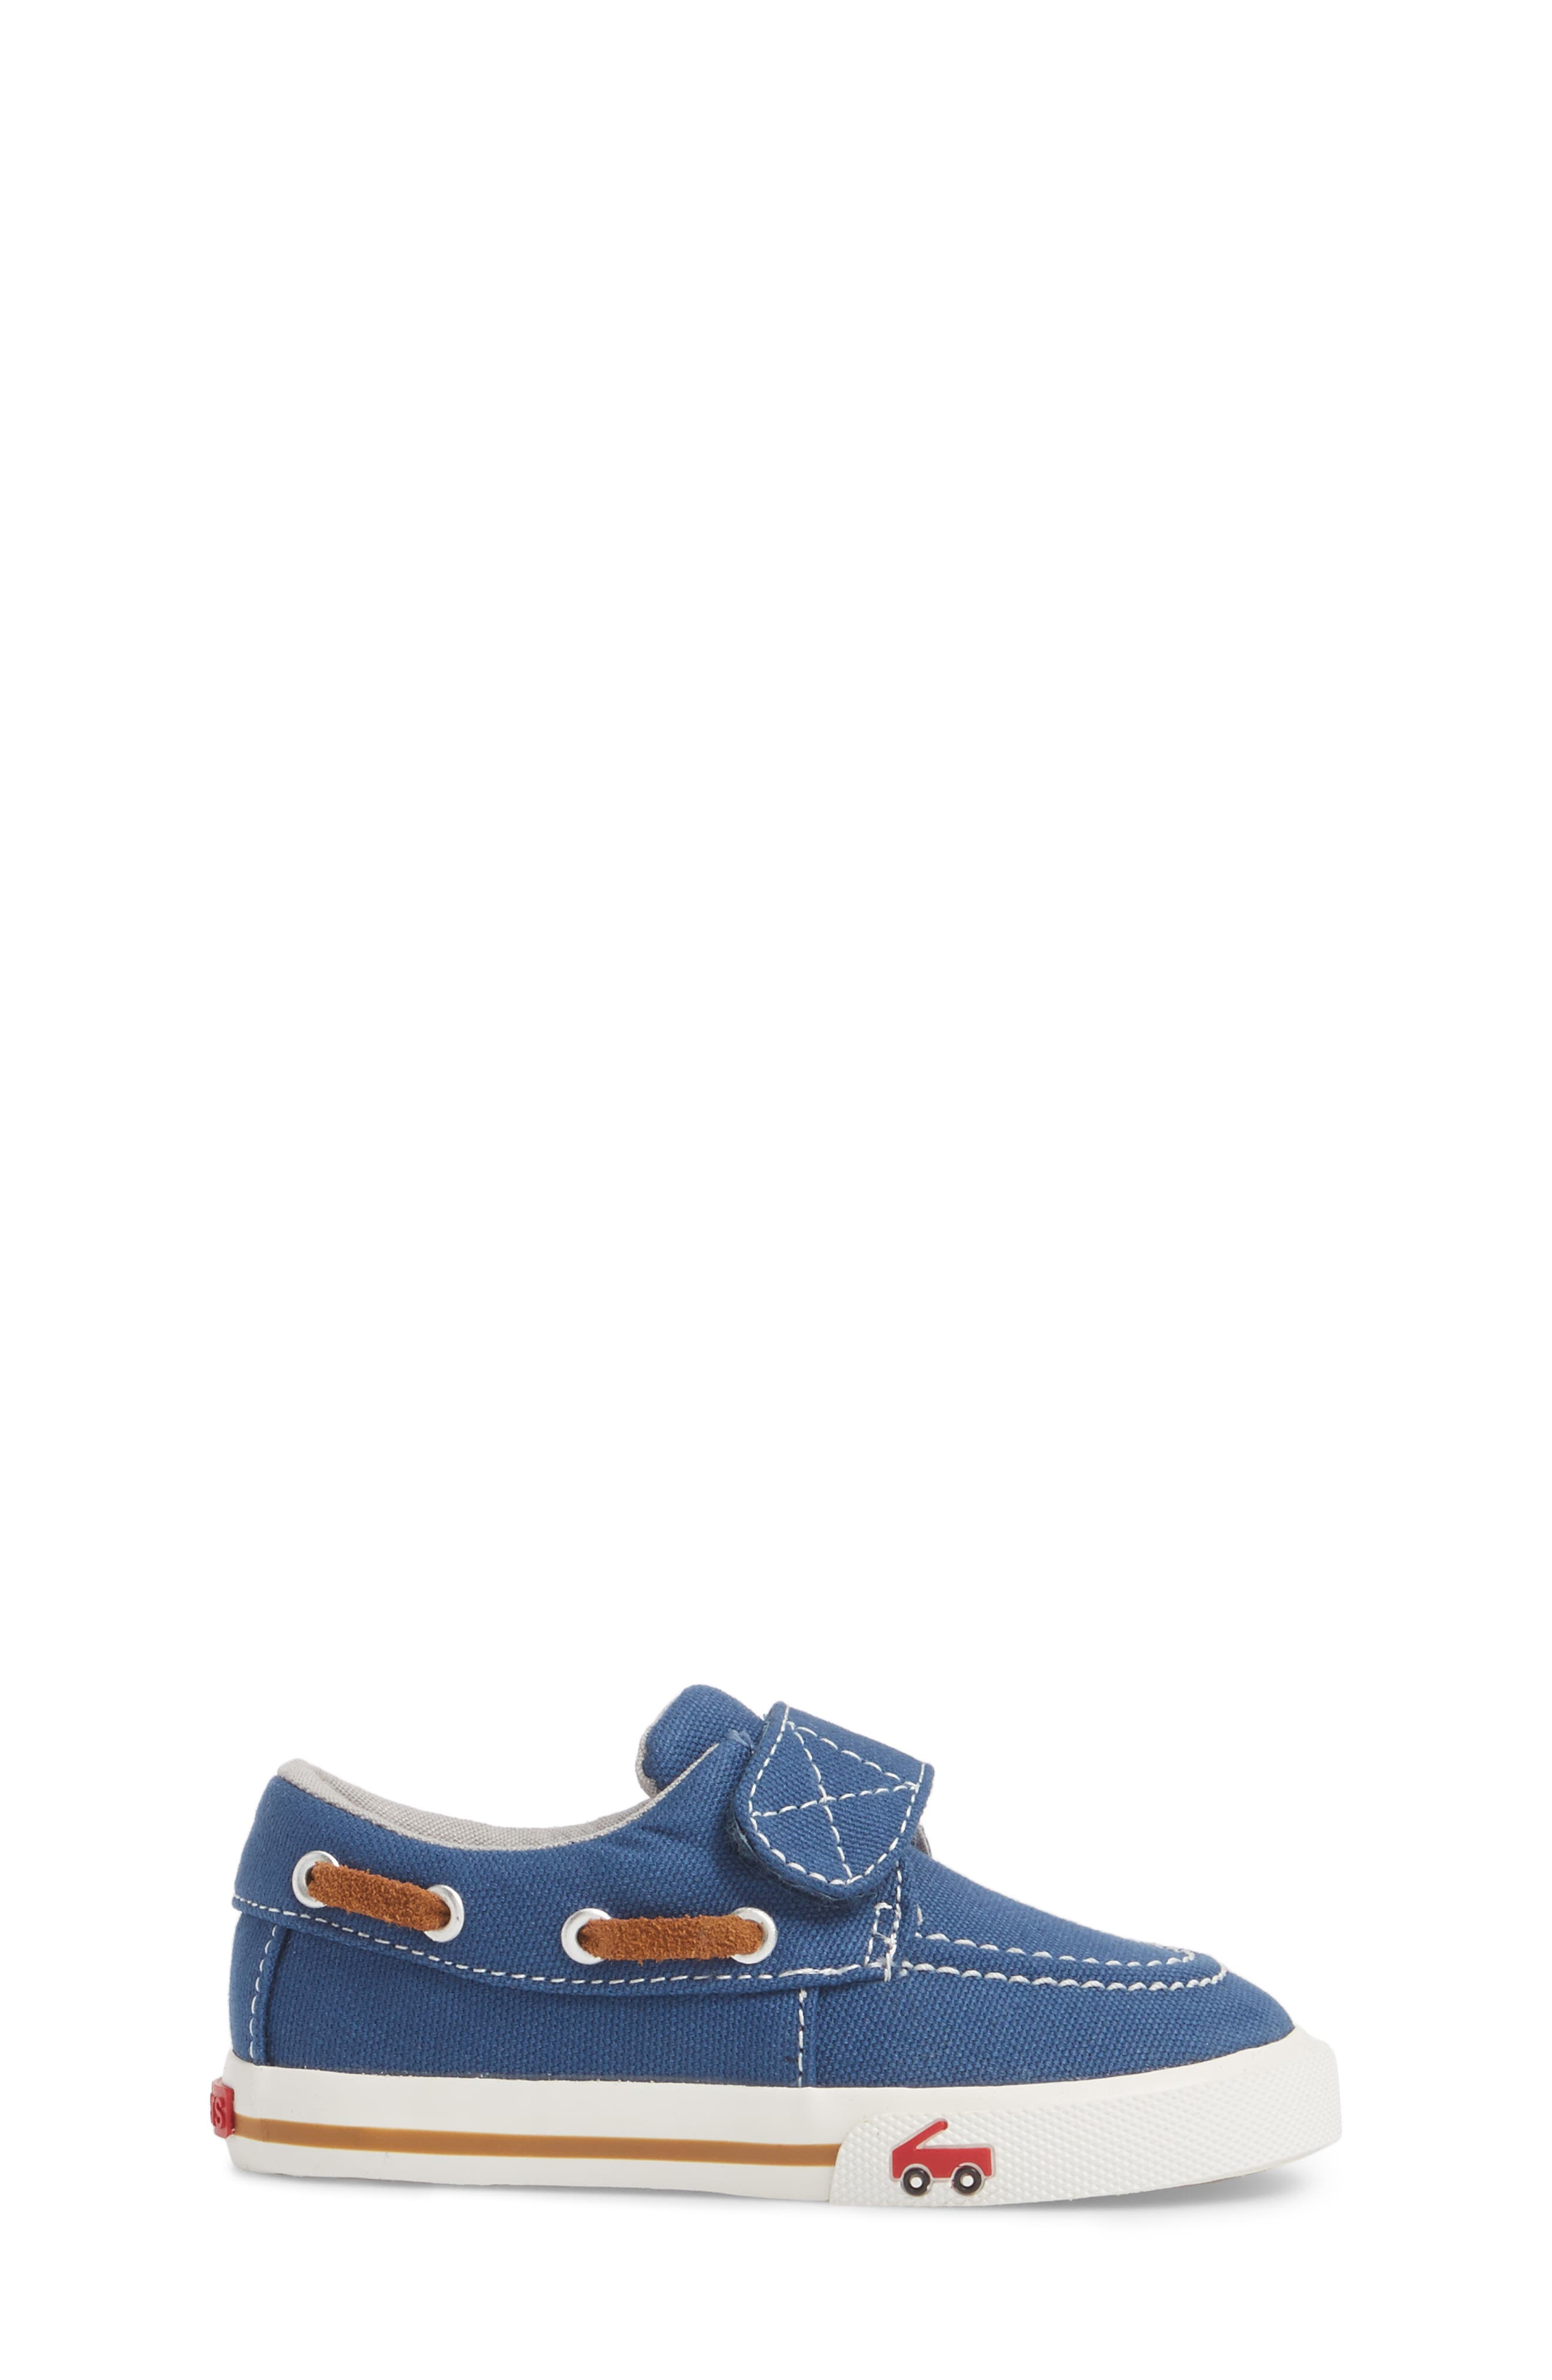 Elias Sneaker,                             Alternate thumbnail 3, color,                             Blue